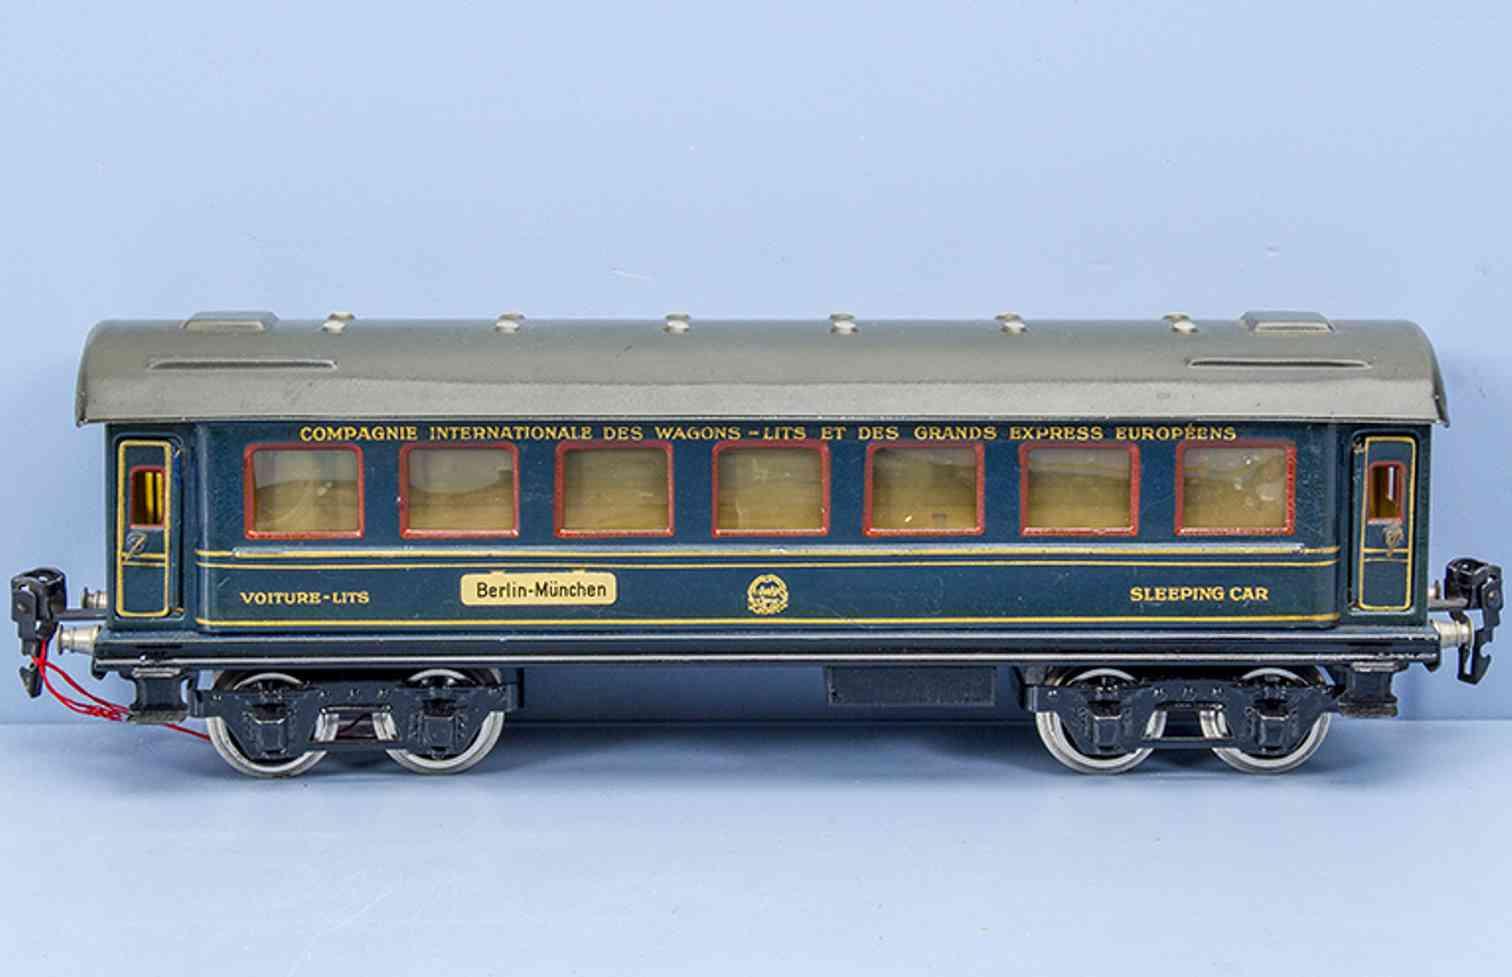 marklin maerklin 1847/0 1930 railway toy international sleeping car blue gauge 0